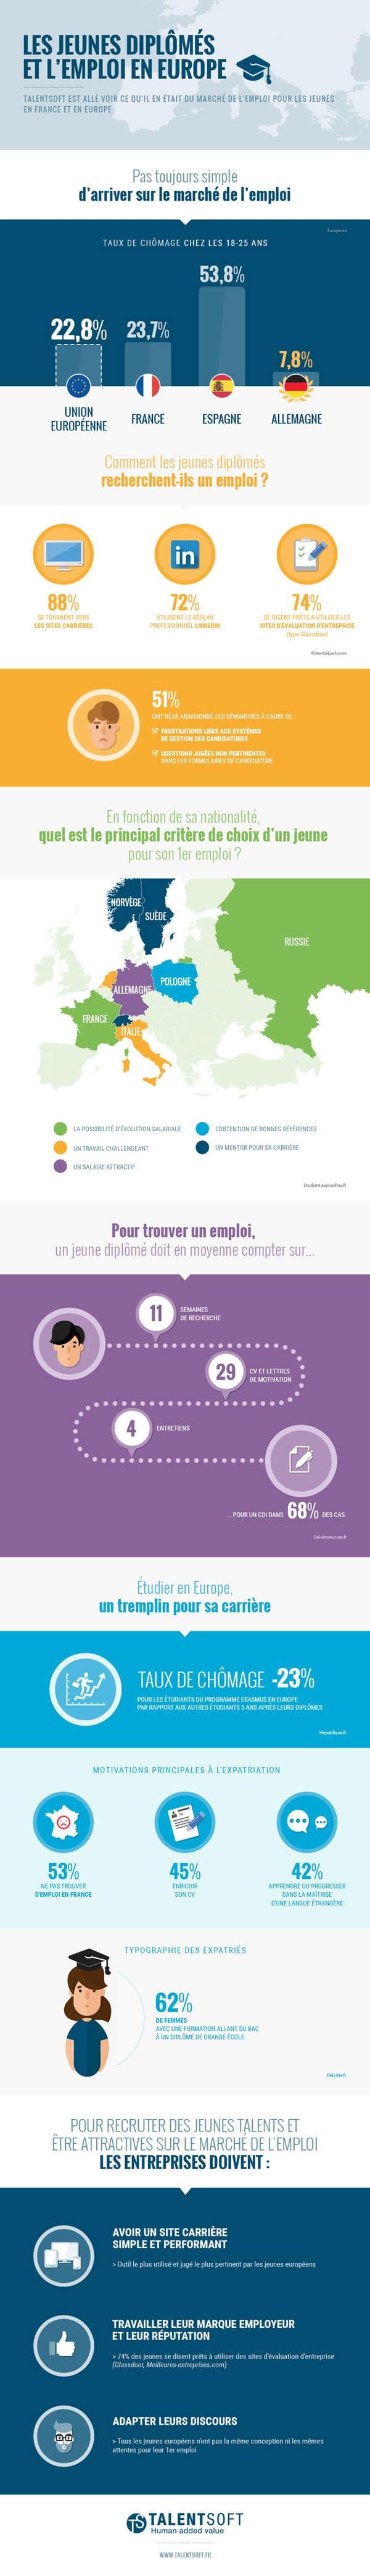 infographie-jeunes-diplomes